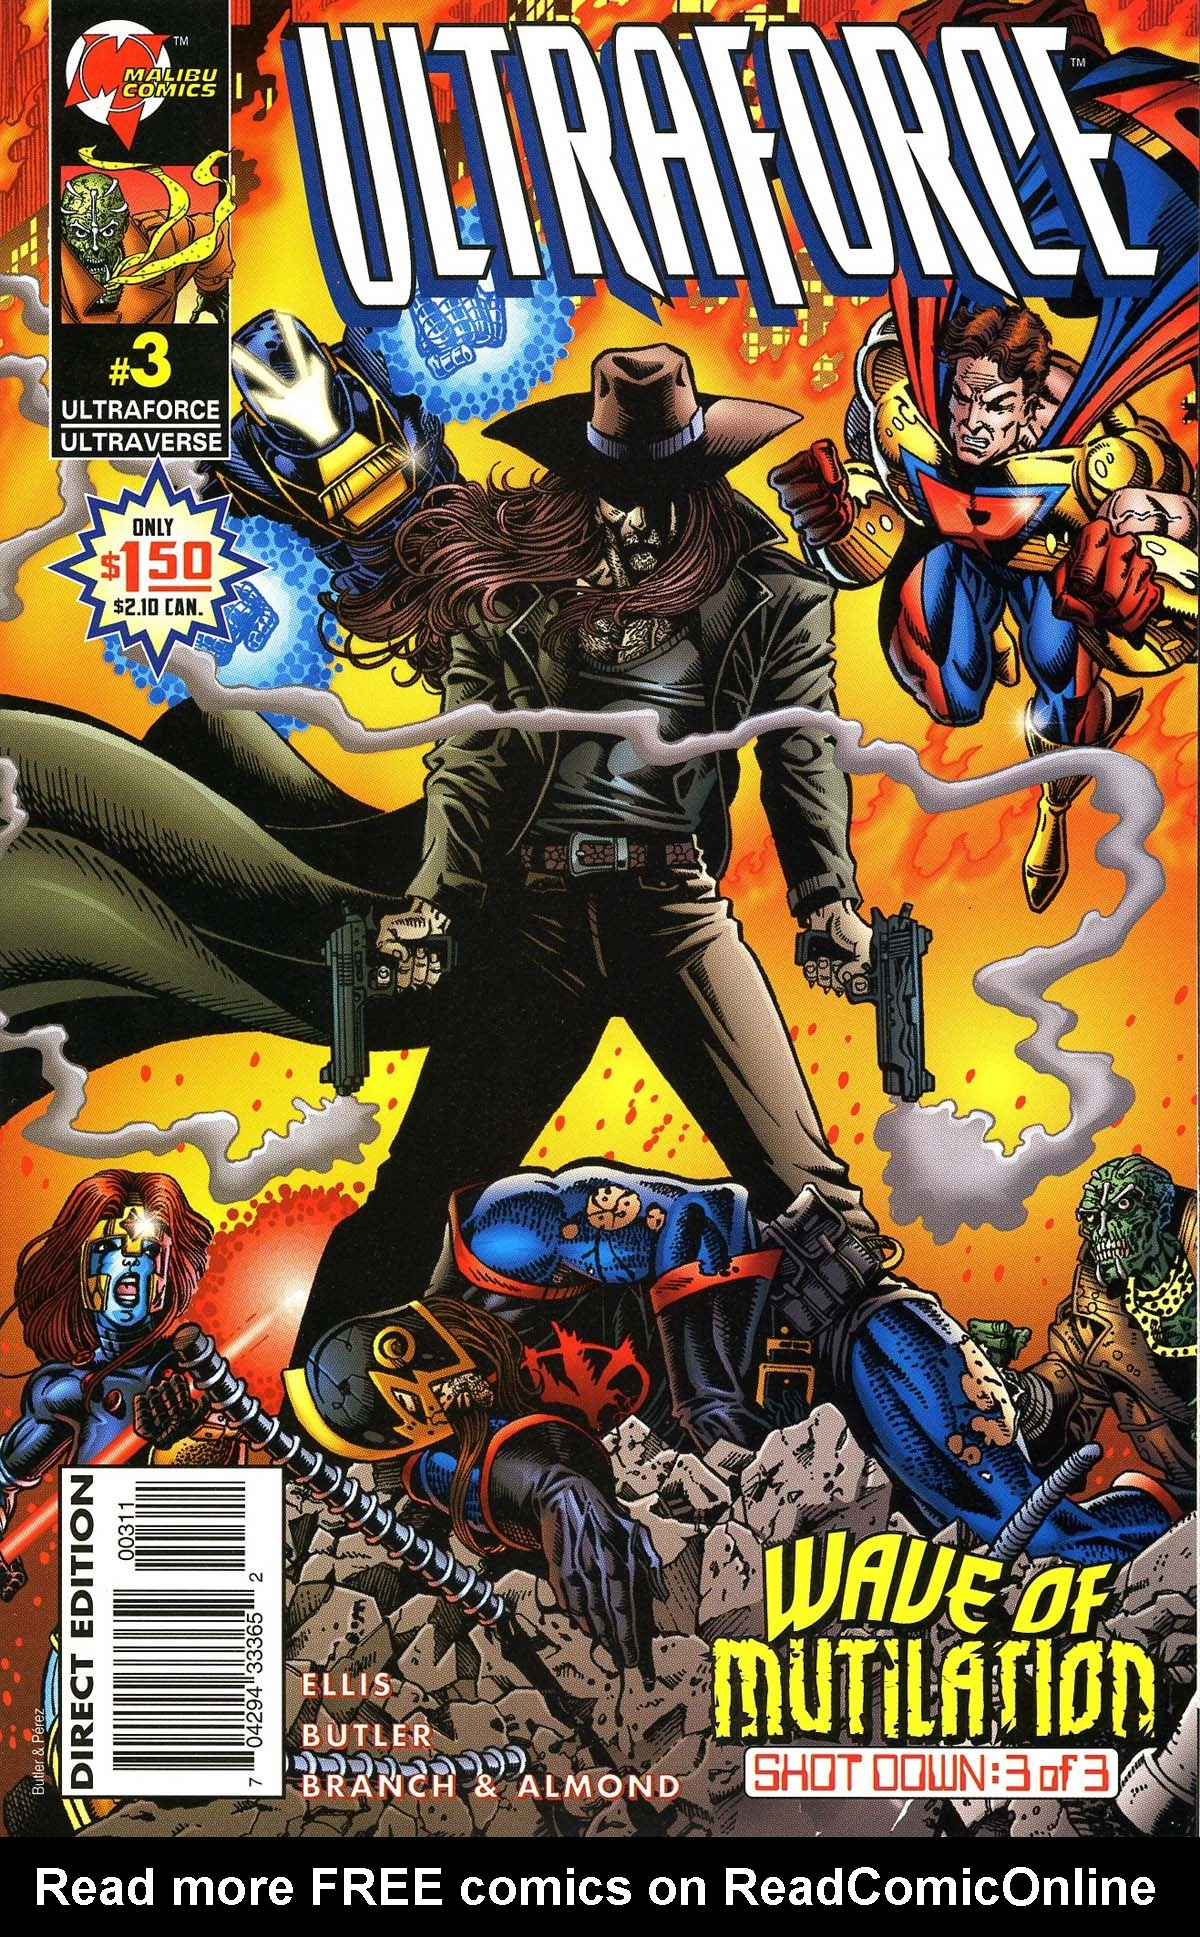 Read online UltraForce (1995) comic - Issue #3